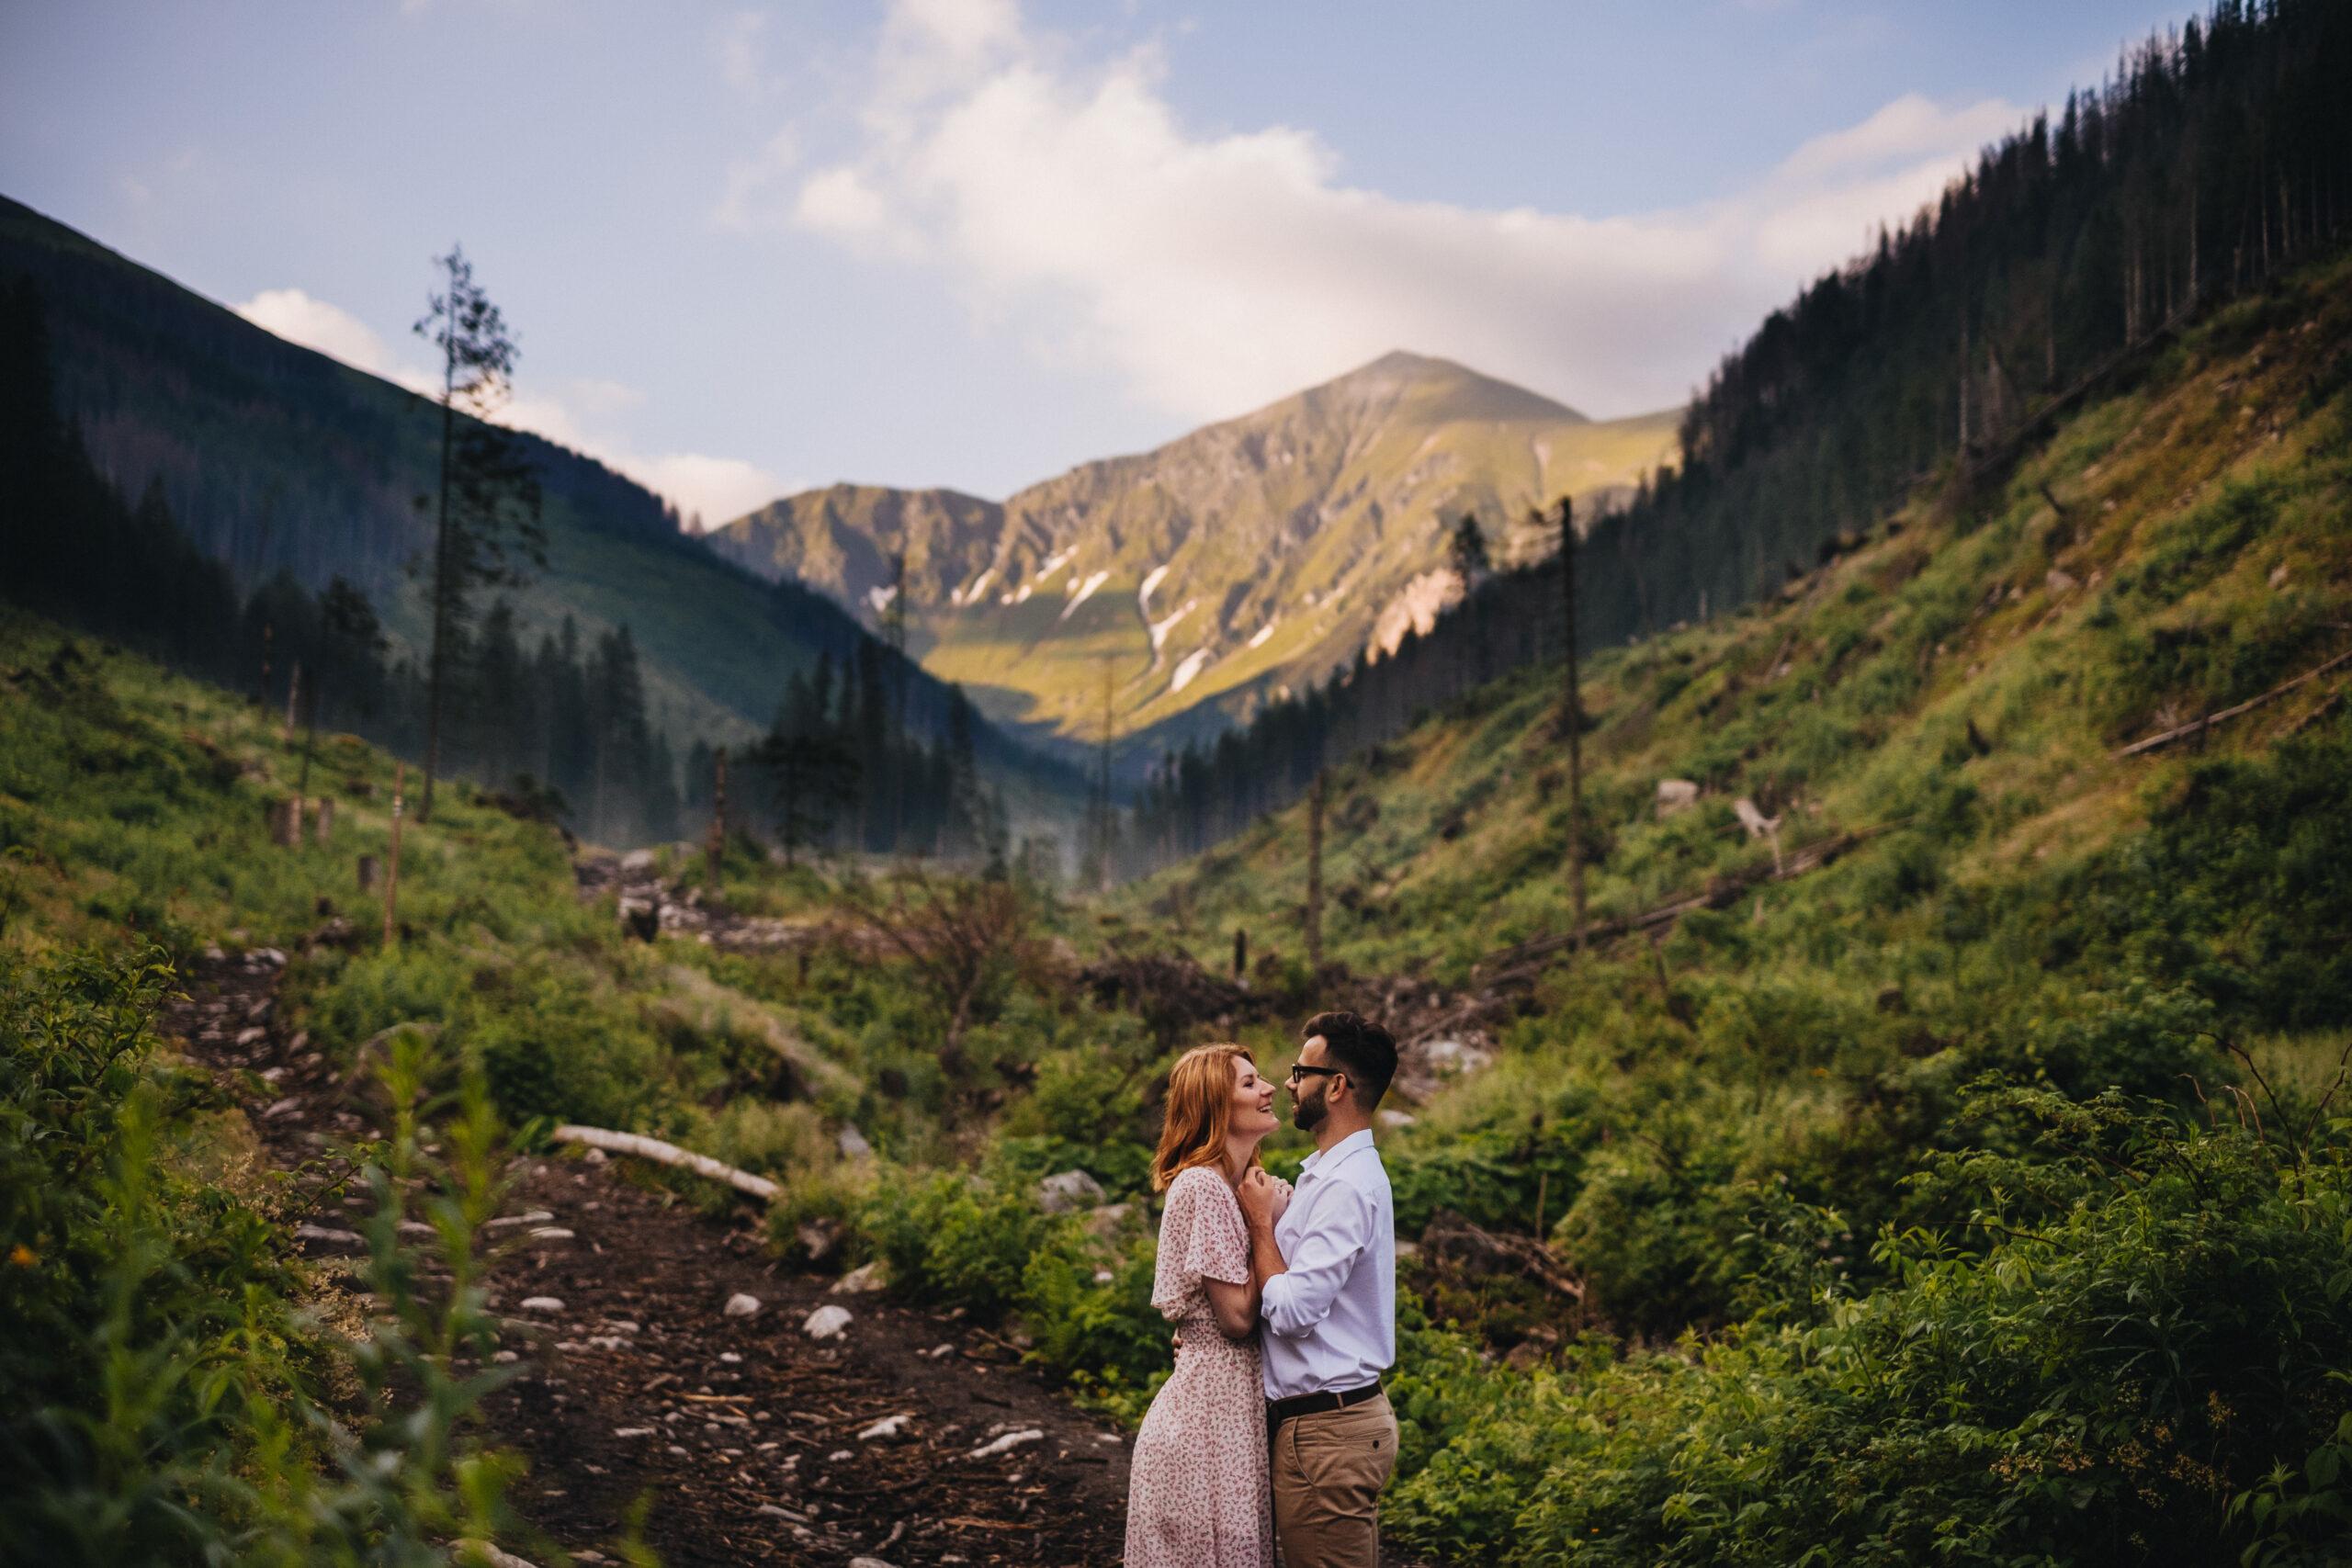 Ślub w górach 13